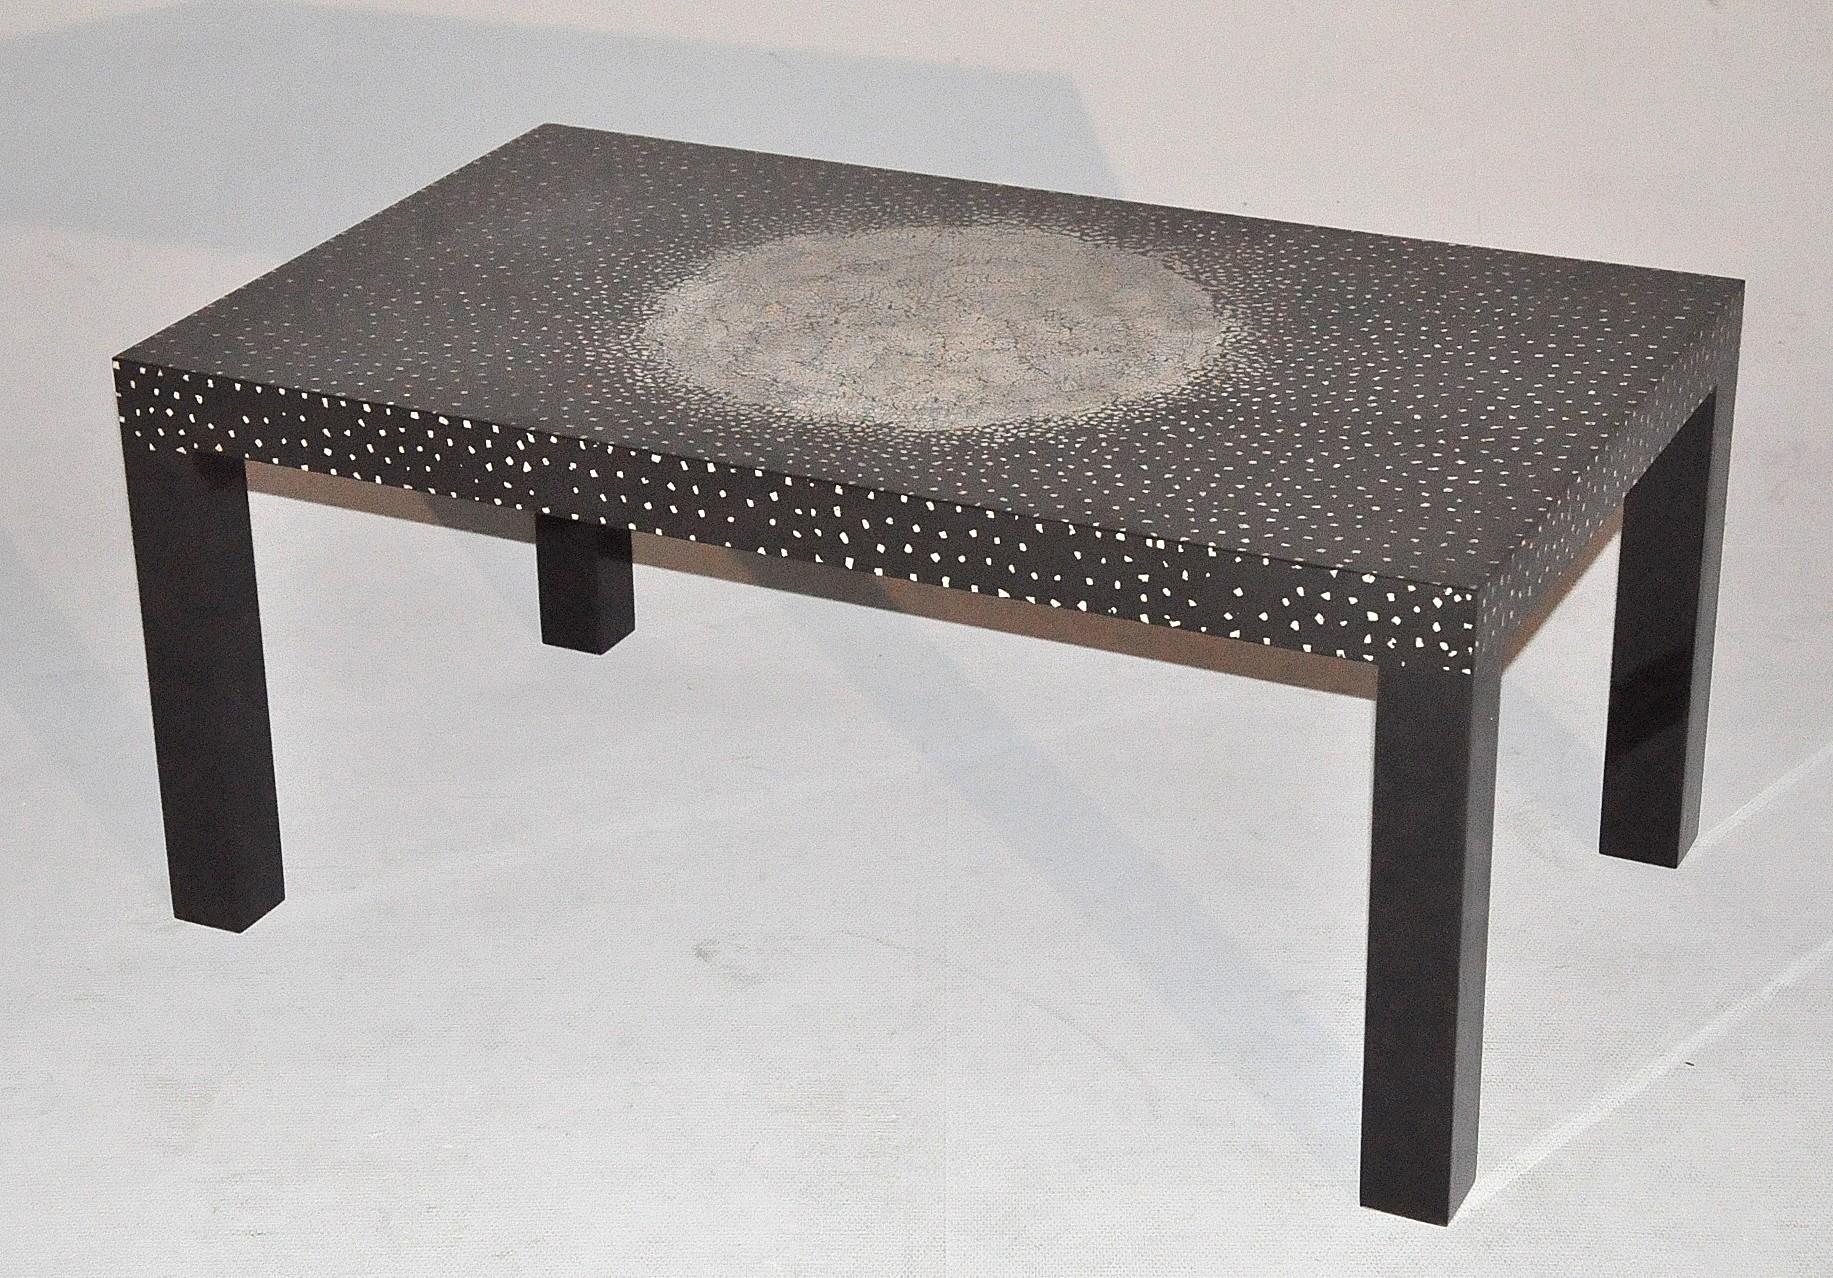 Table Basse Rectangulaire Laque Noire Et Coquille D 39 Oeuf